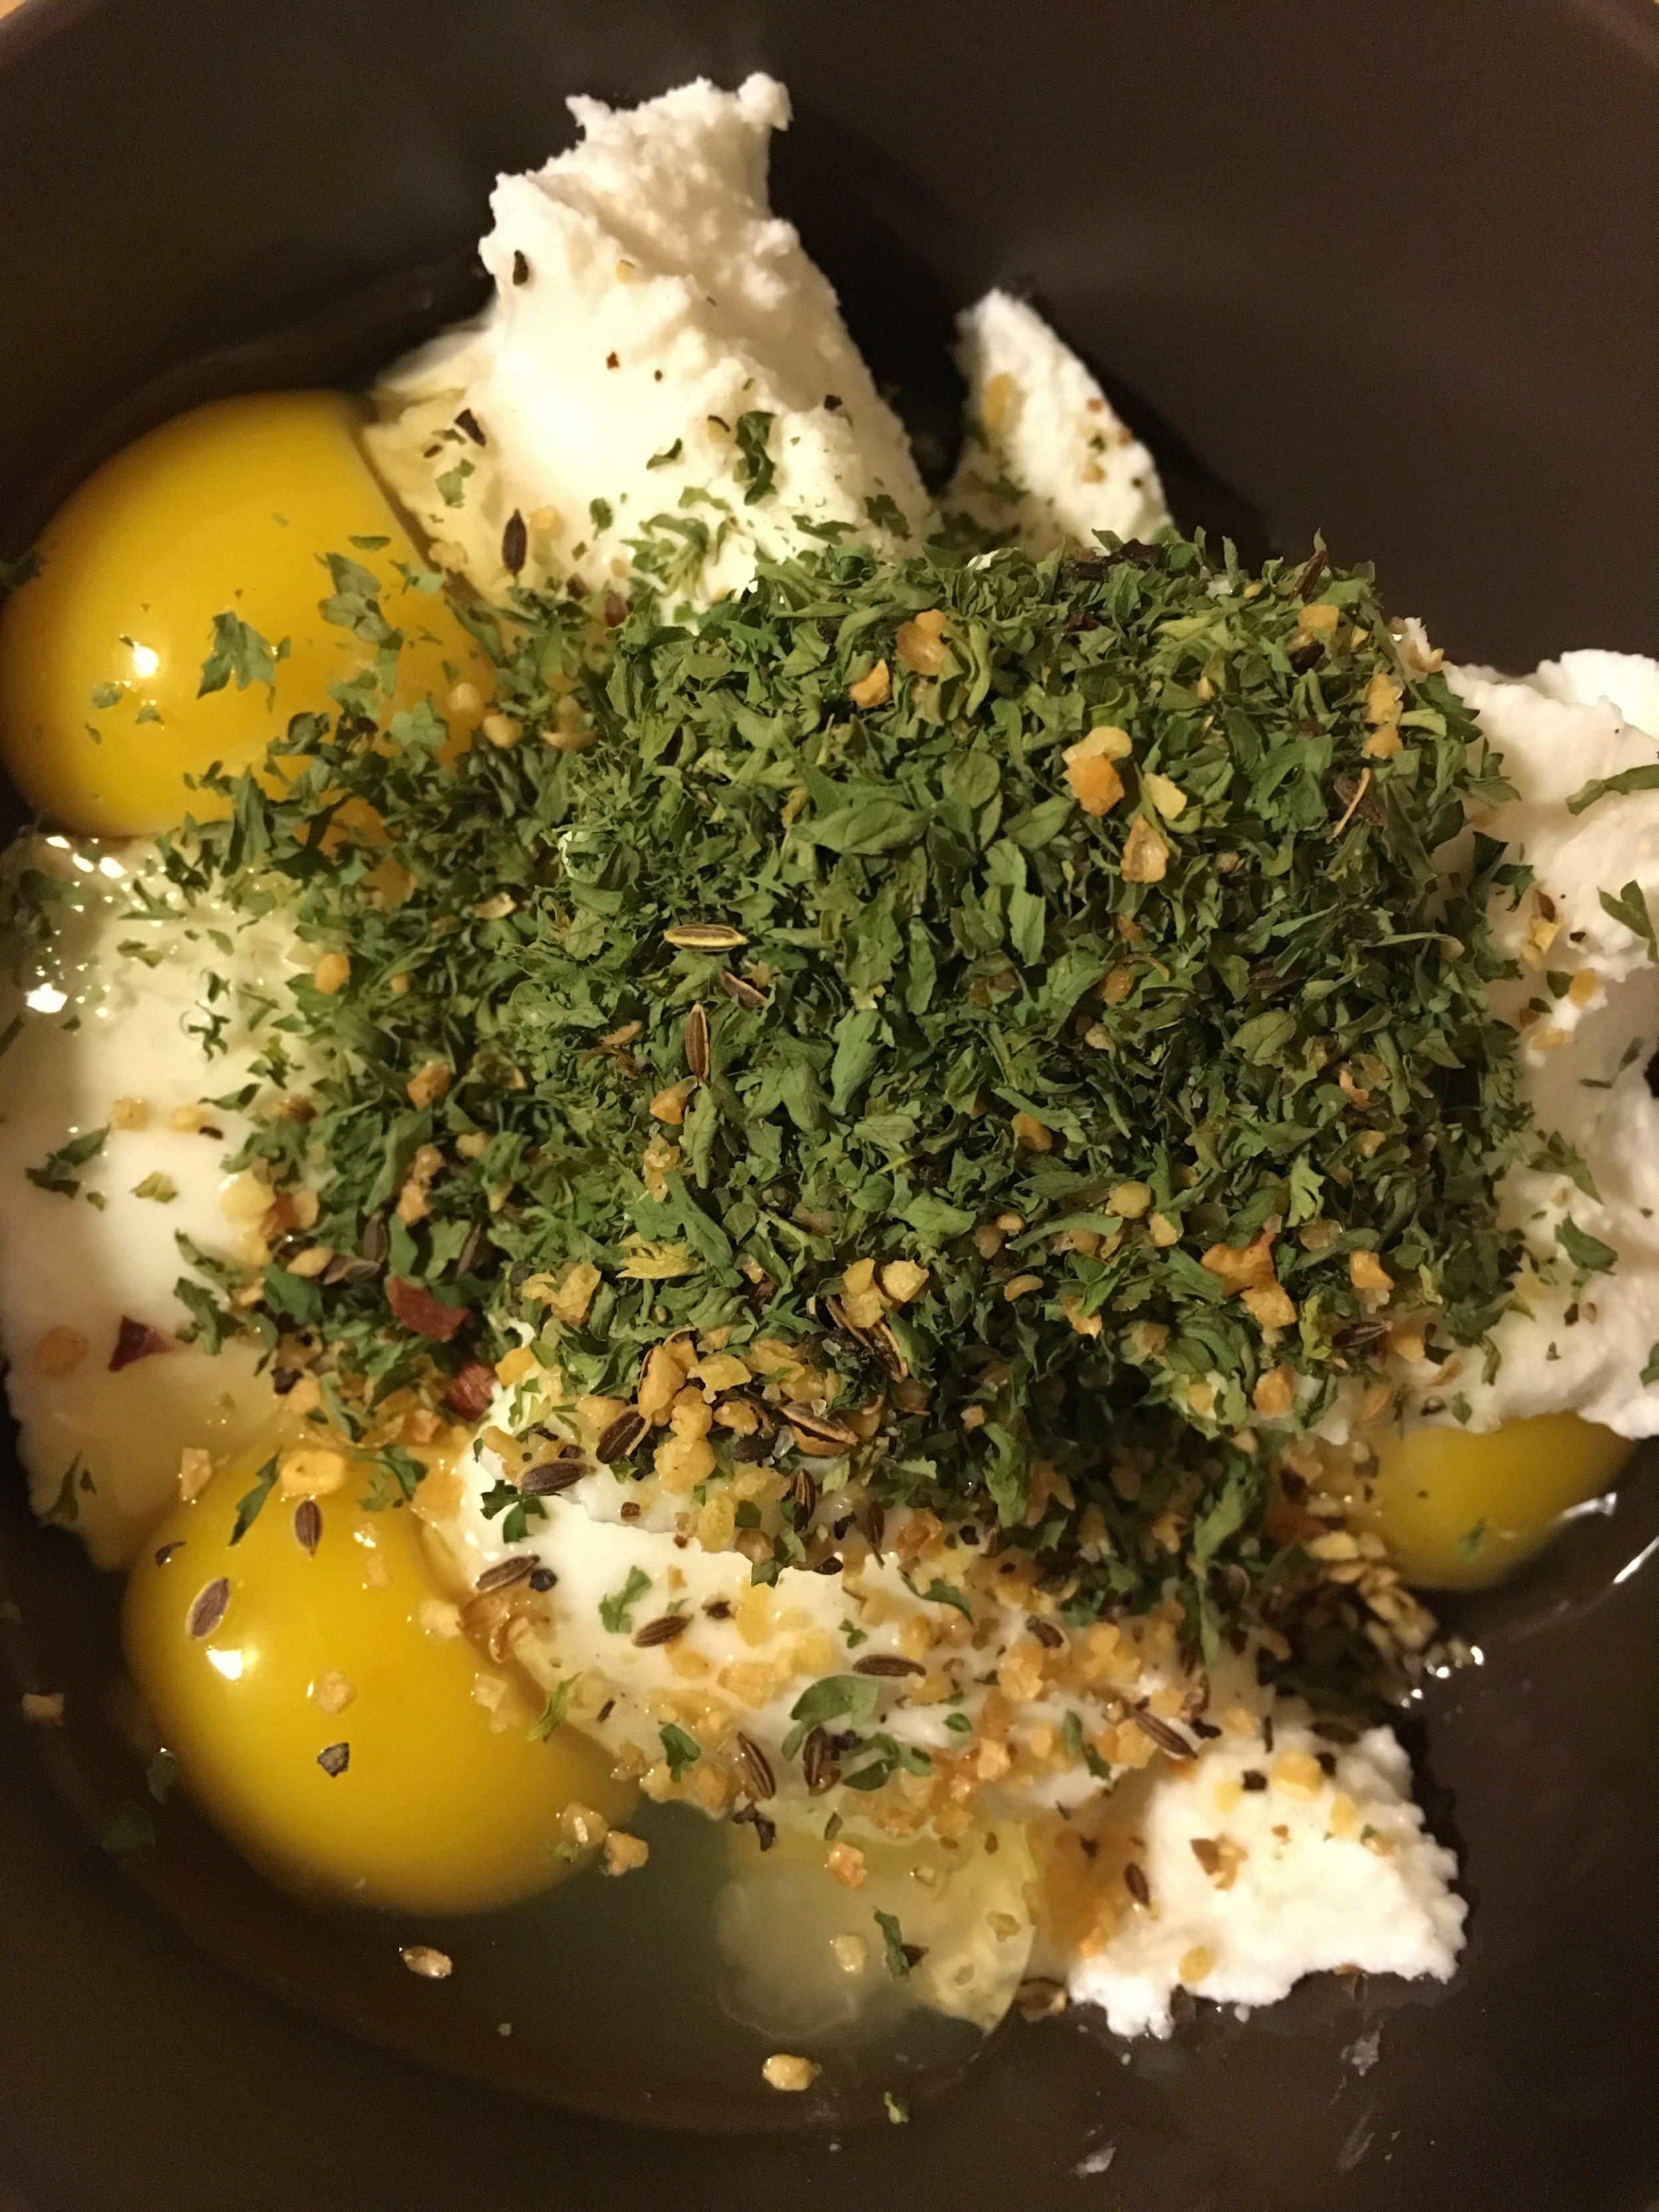 Ricotta Mixture: 3 eggs, 2 cups ricotta, basil, Mustard seed, oregano, salt, pepper, garlic